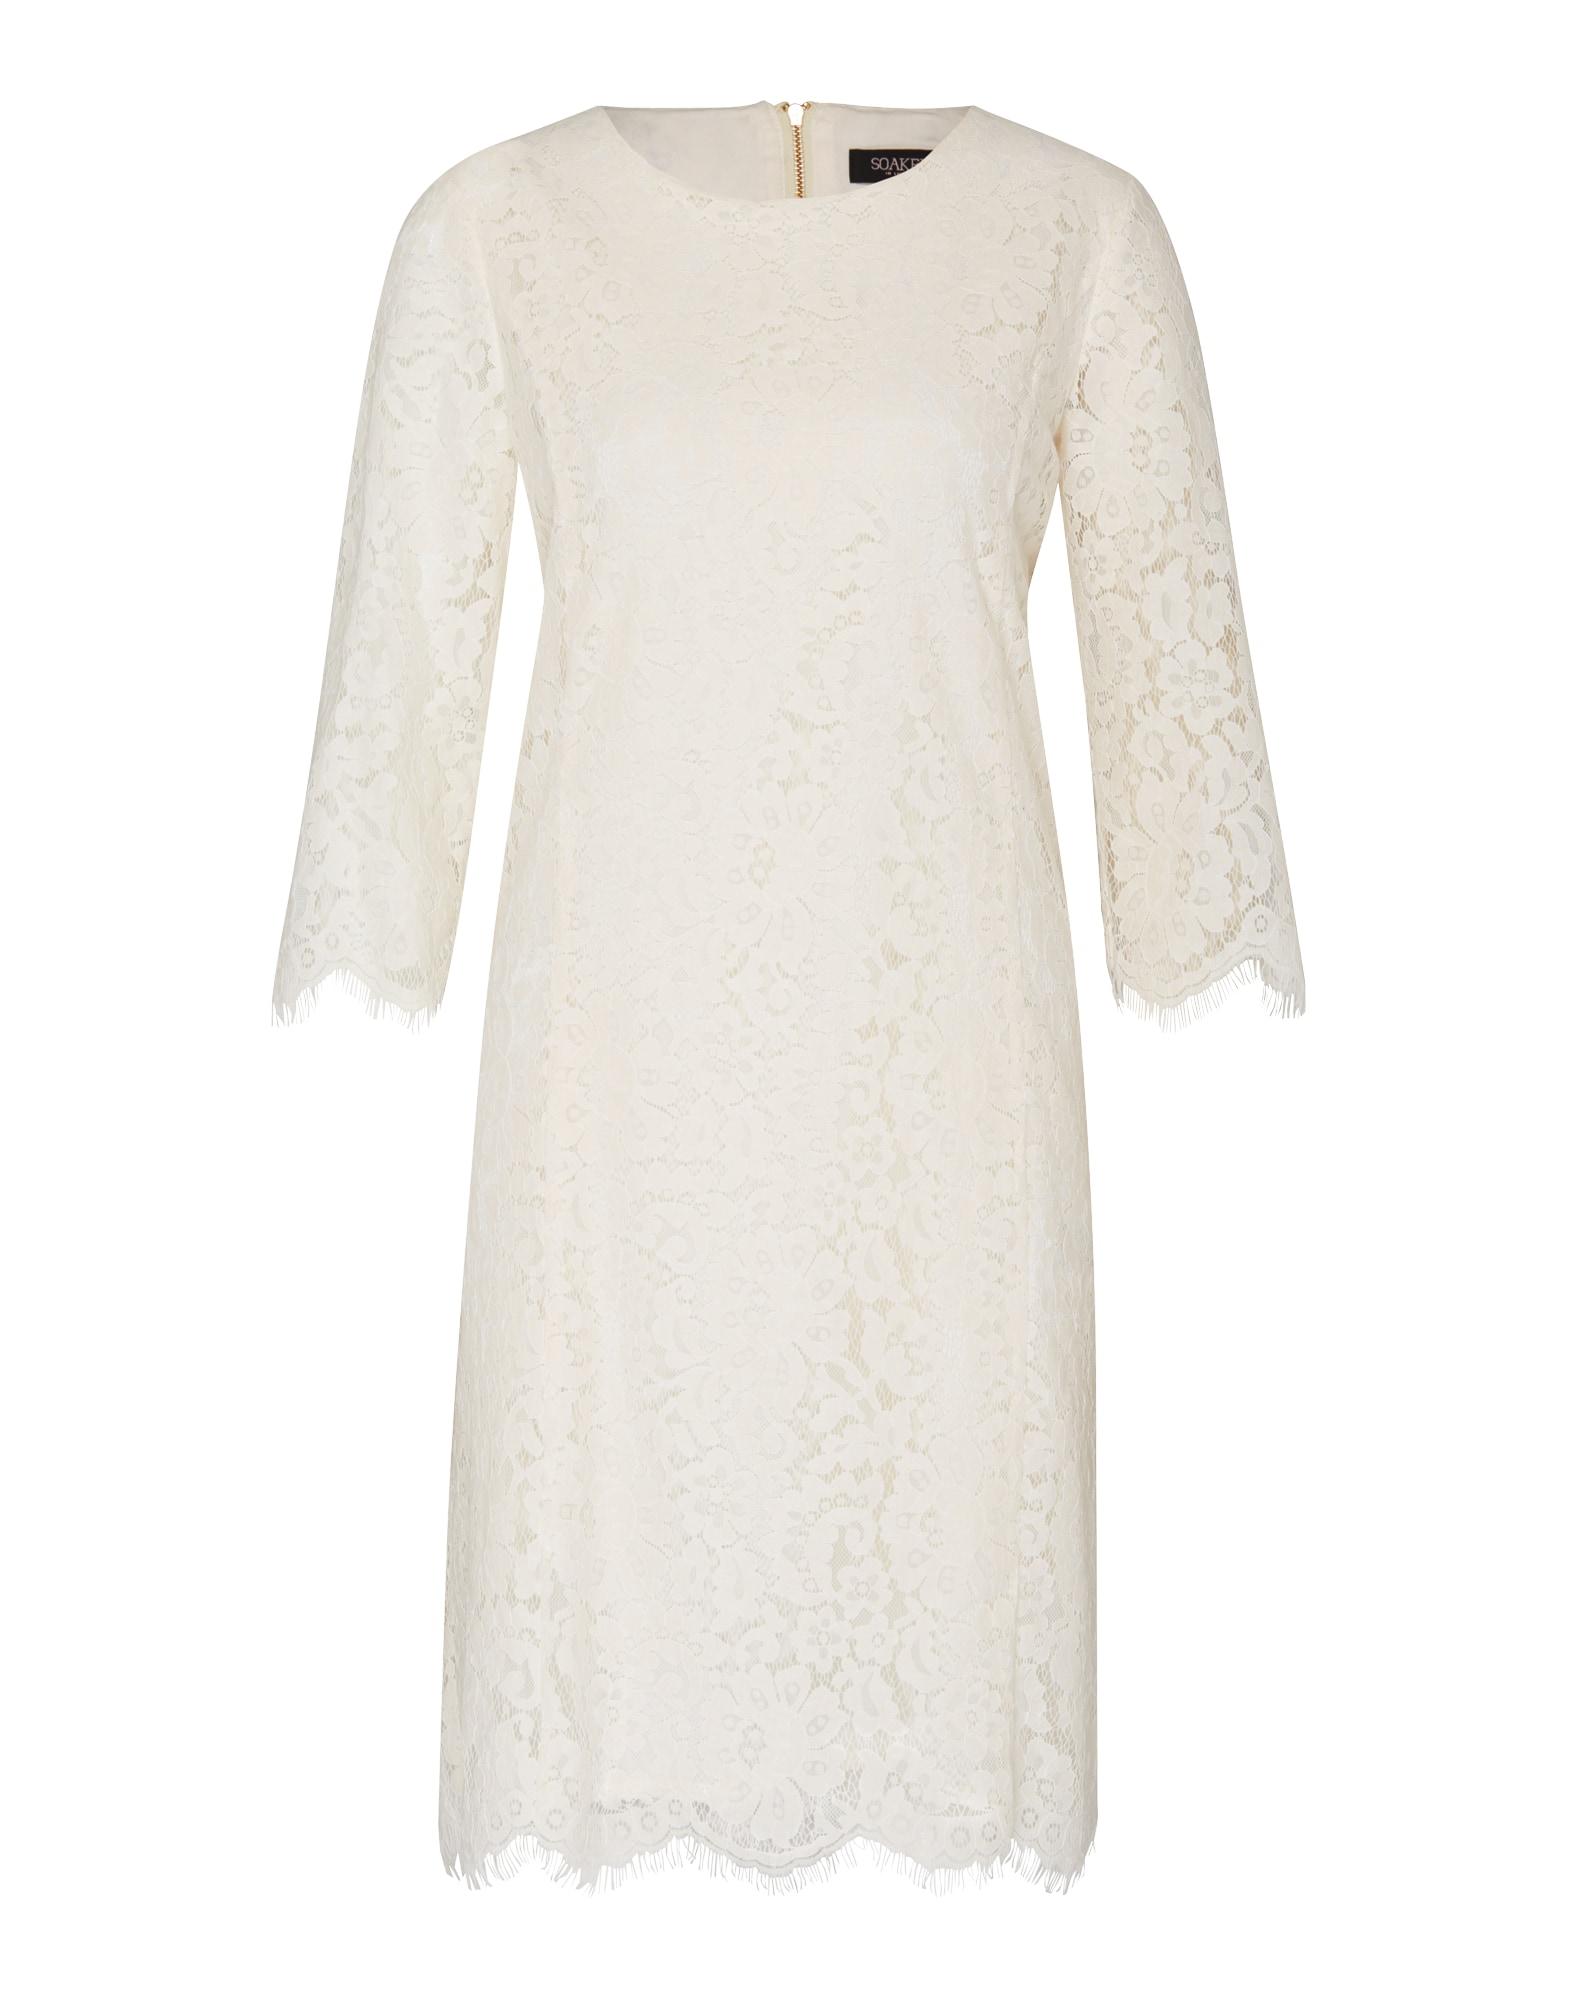 Koktejlové šaty Lulla bílá SOAKED IN LUXURY